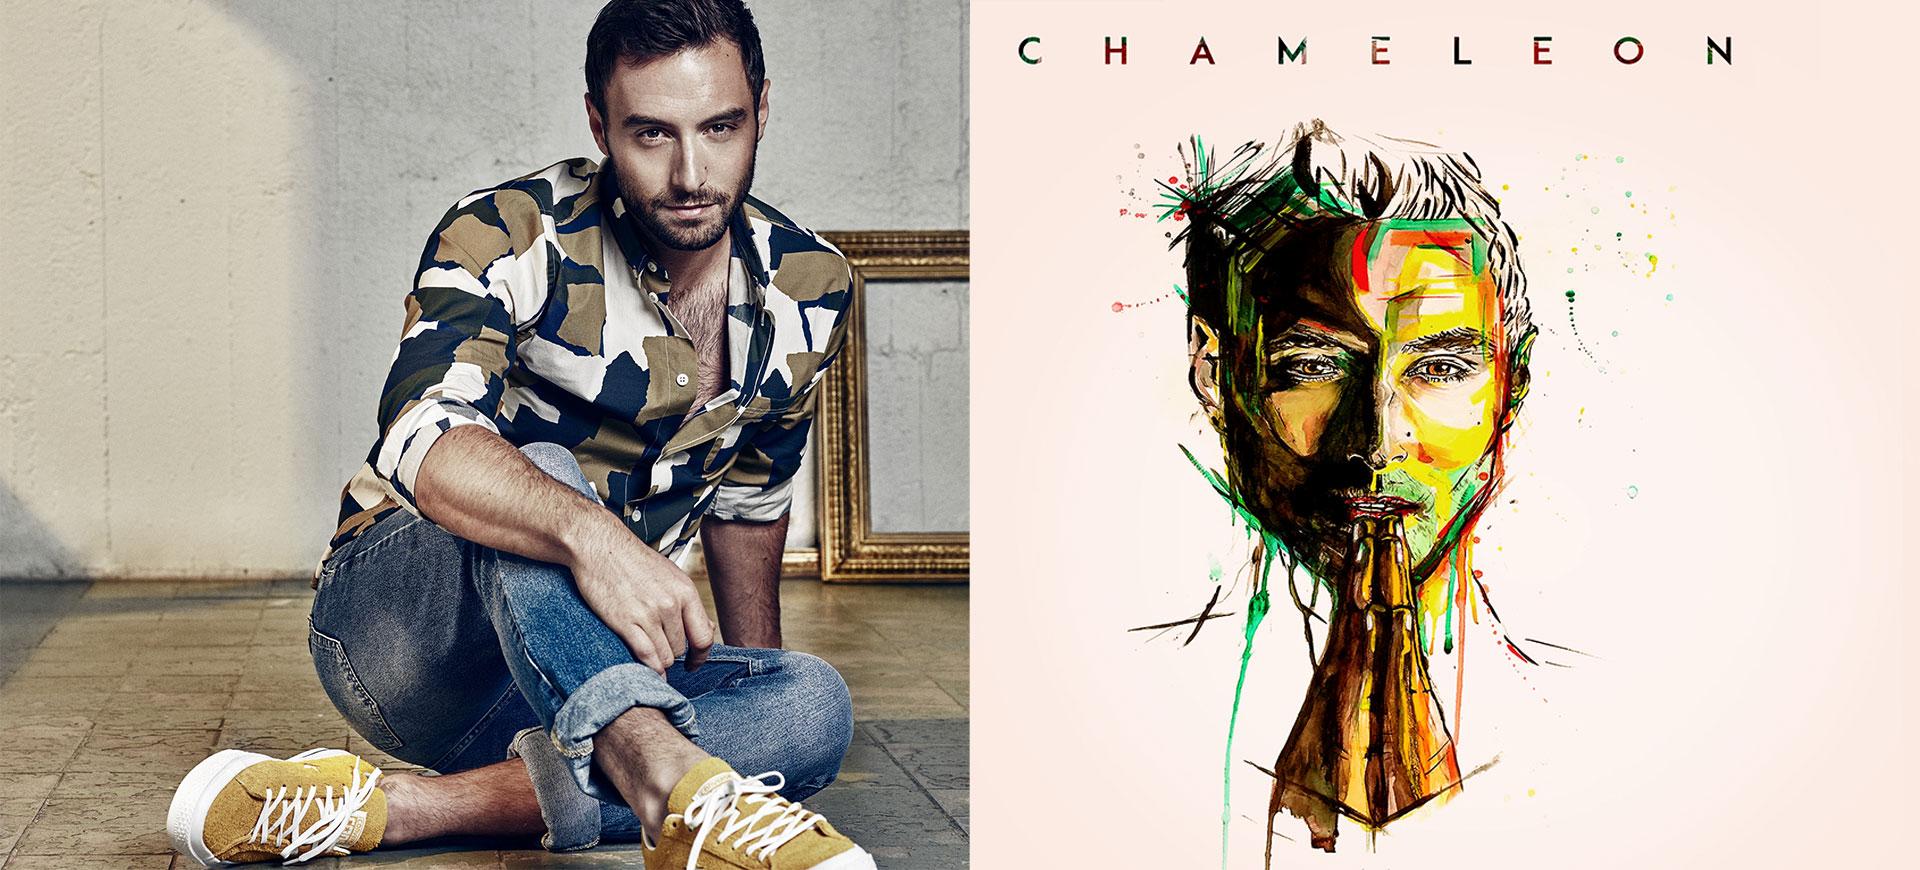 måns zelmerlöw chameleont glorious album singel